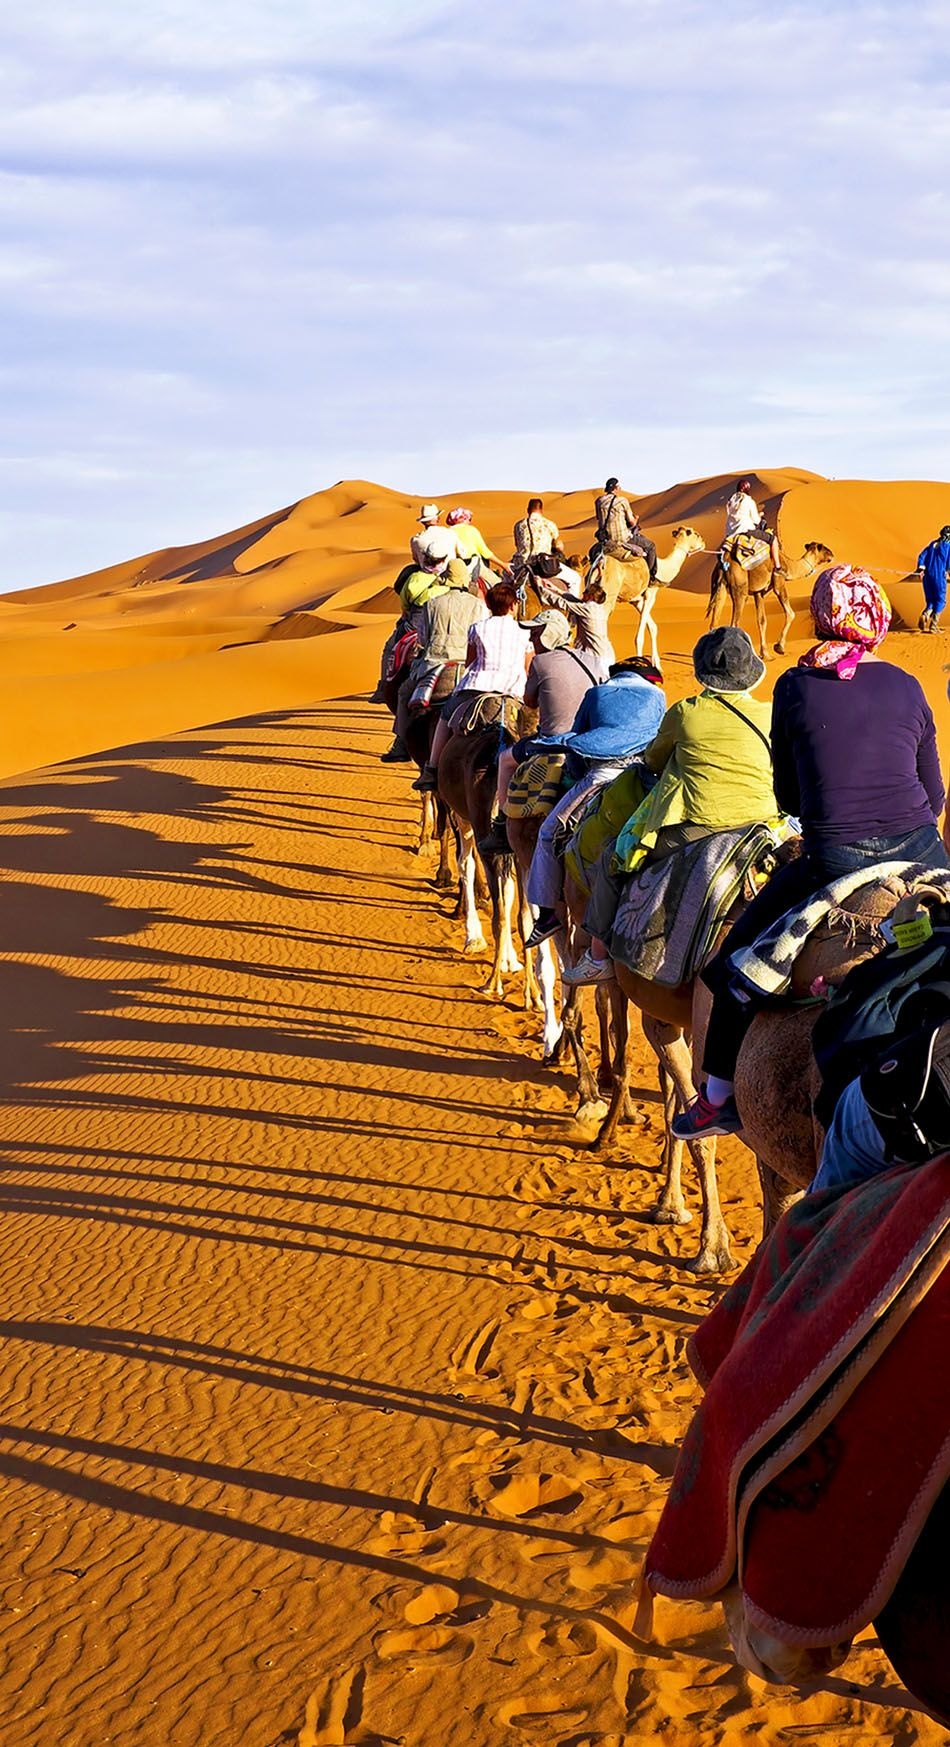 Riding Camels in a Caravan through the sand dunes in the Sahara Desert, Morocco !    |    20 Photos that Prove Morocco is a Dream Destination